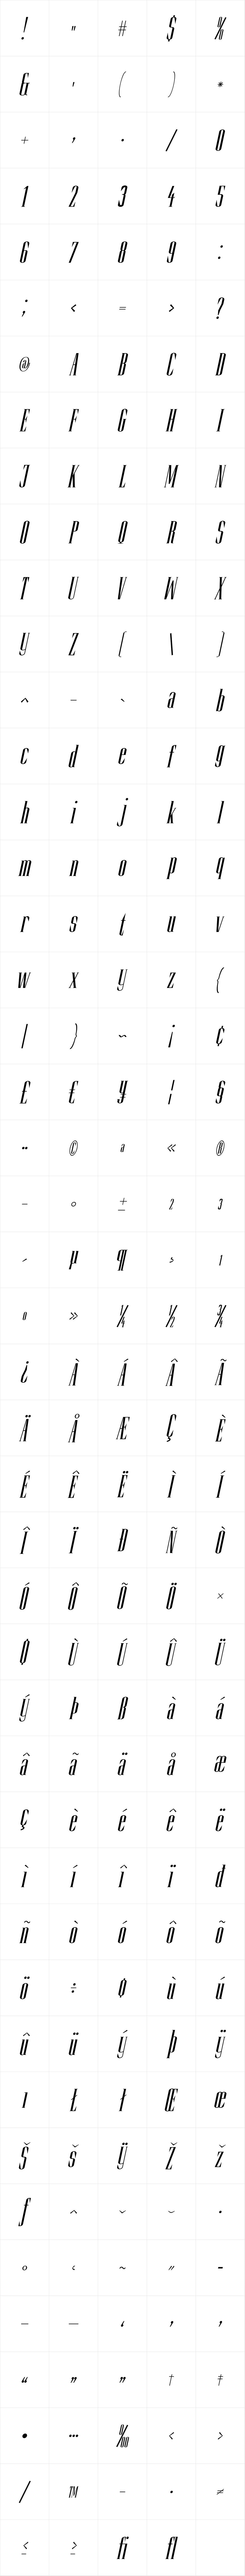 Slim Kim Plain Italic